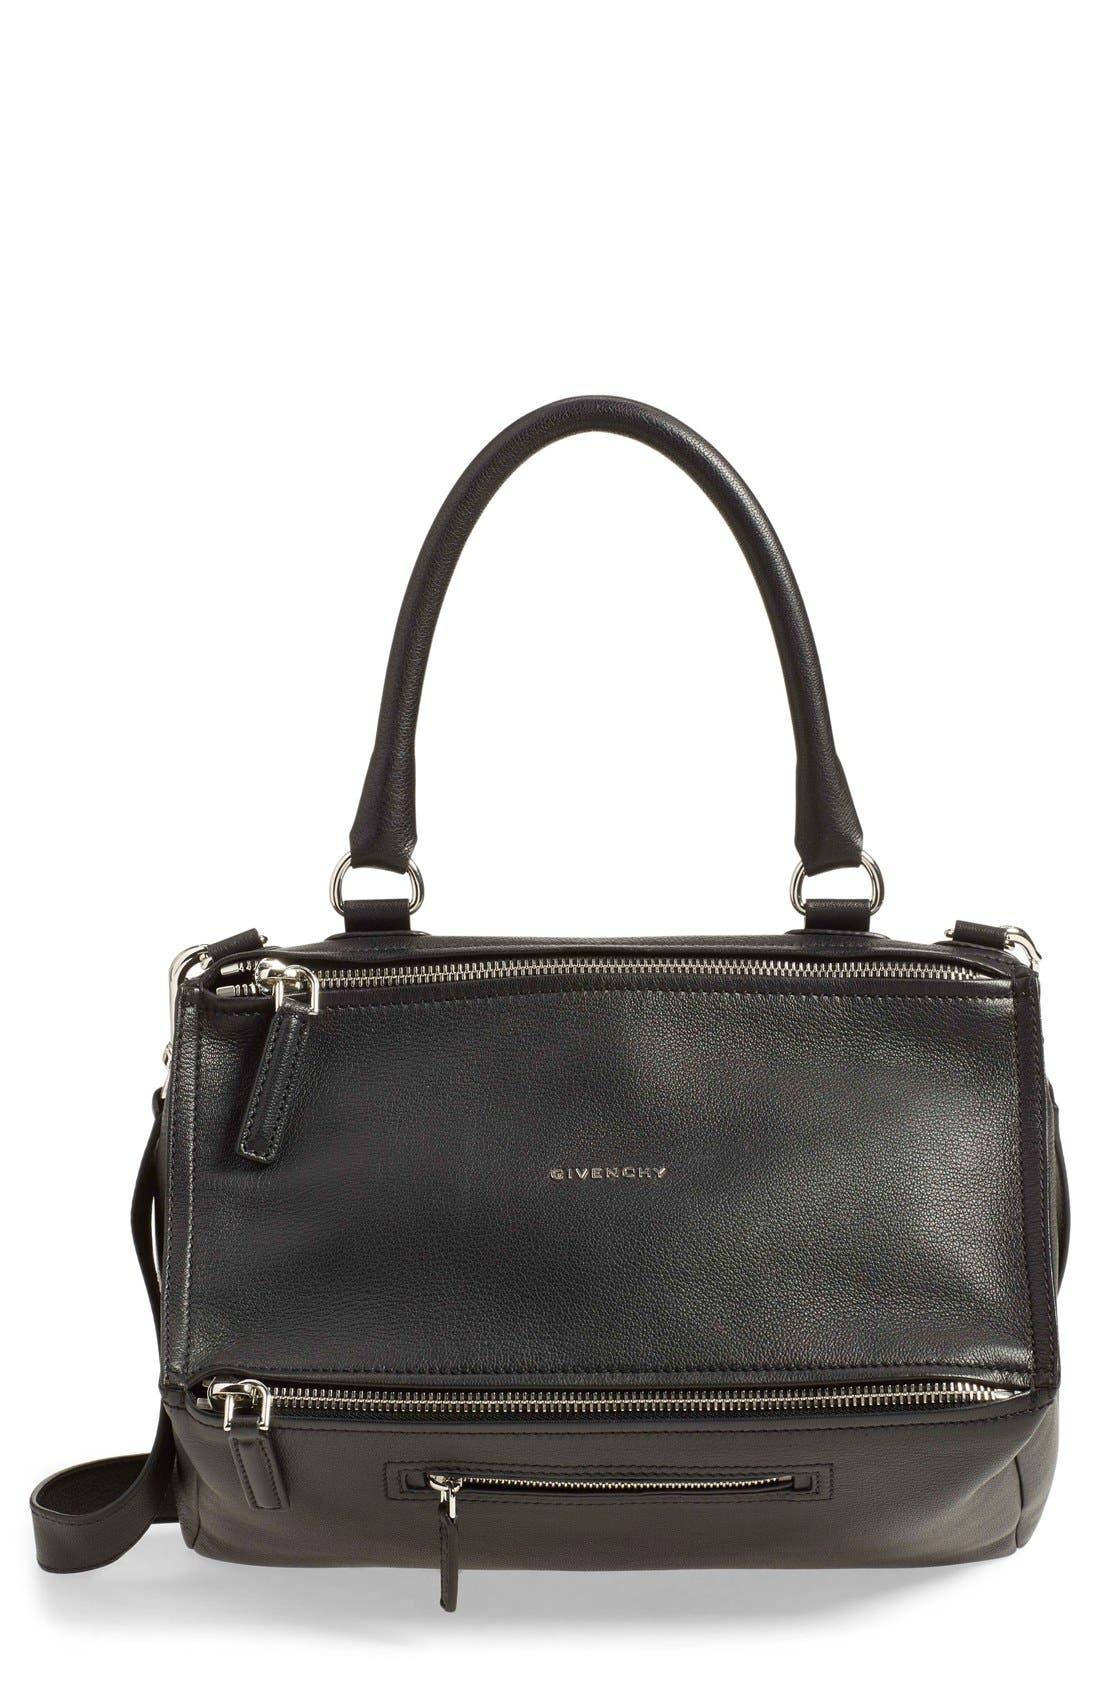 Givenchy Medium Pandora Sugar Leather Satchel | Nordstrom